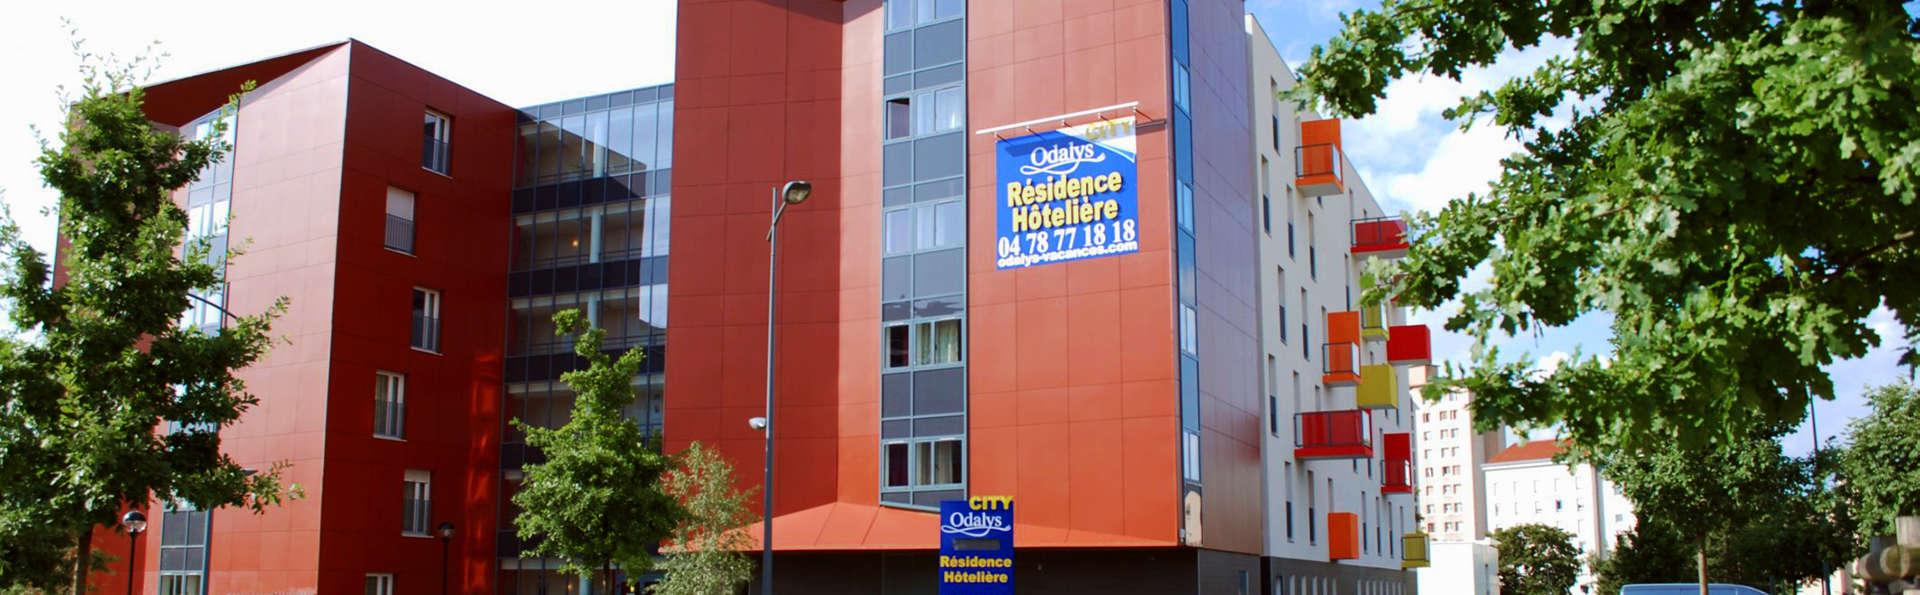 Appart'Hôtel Odalys Bioparc - EDIT_Fachada1.jpg